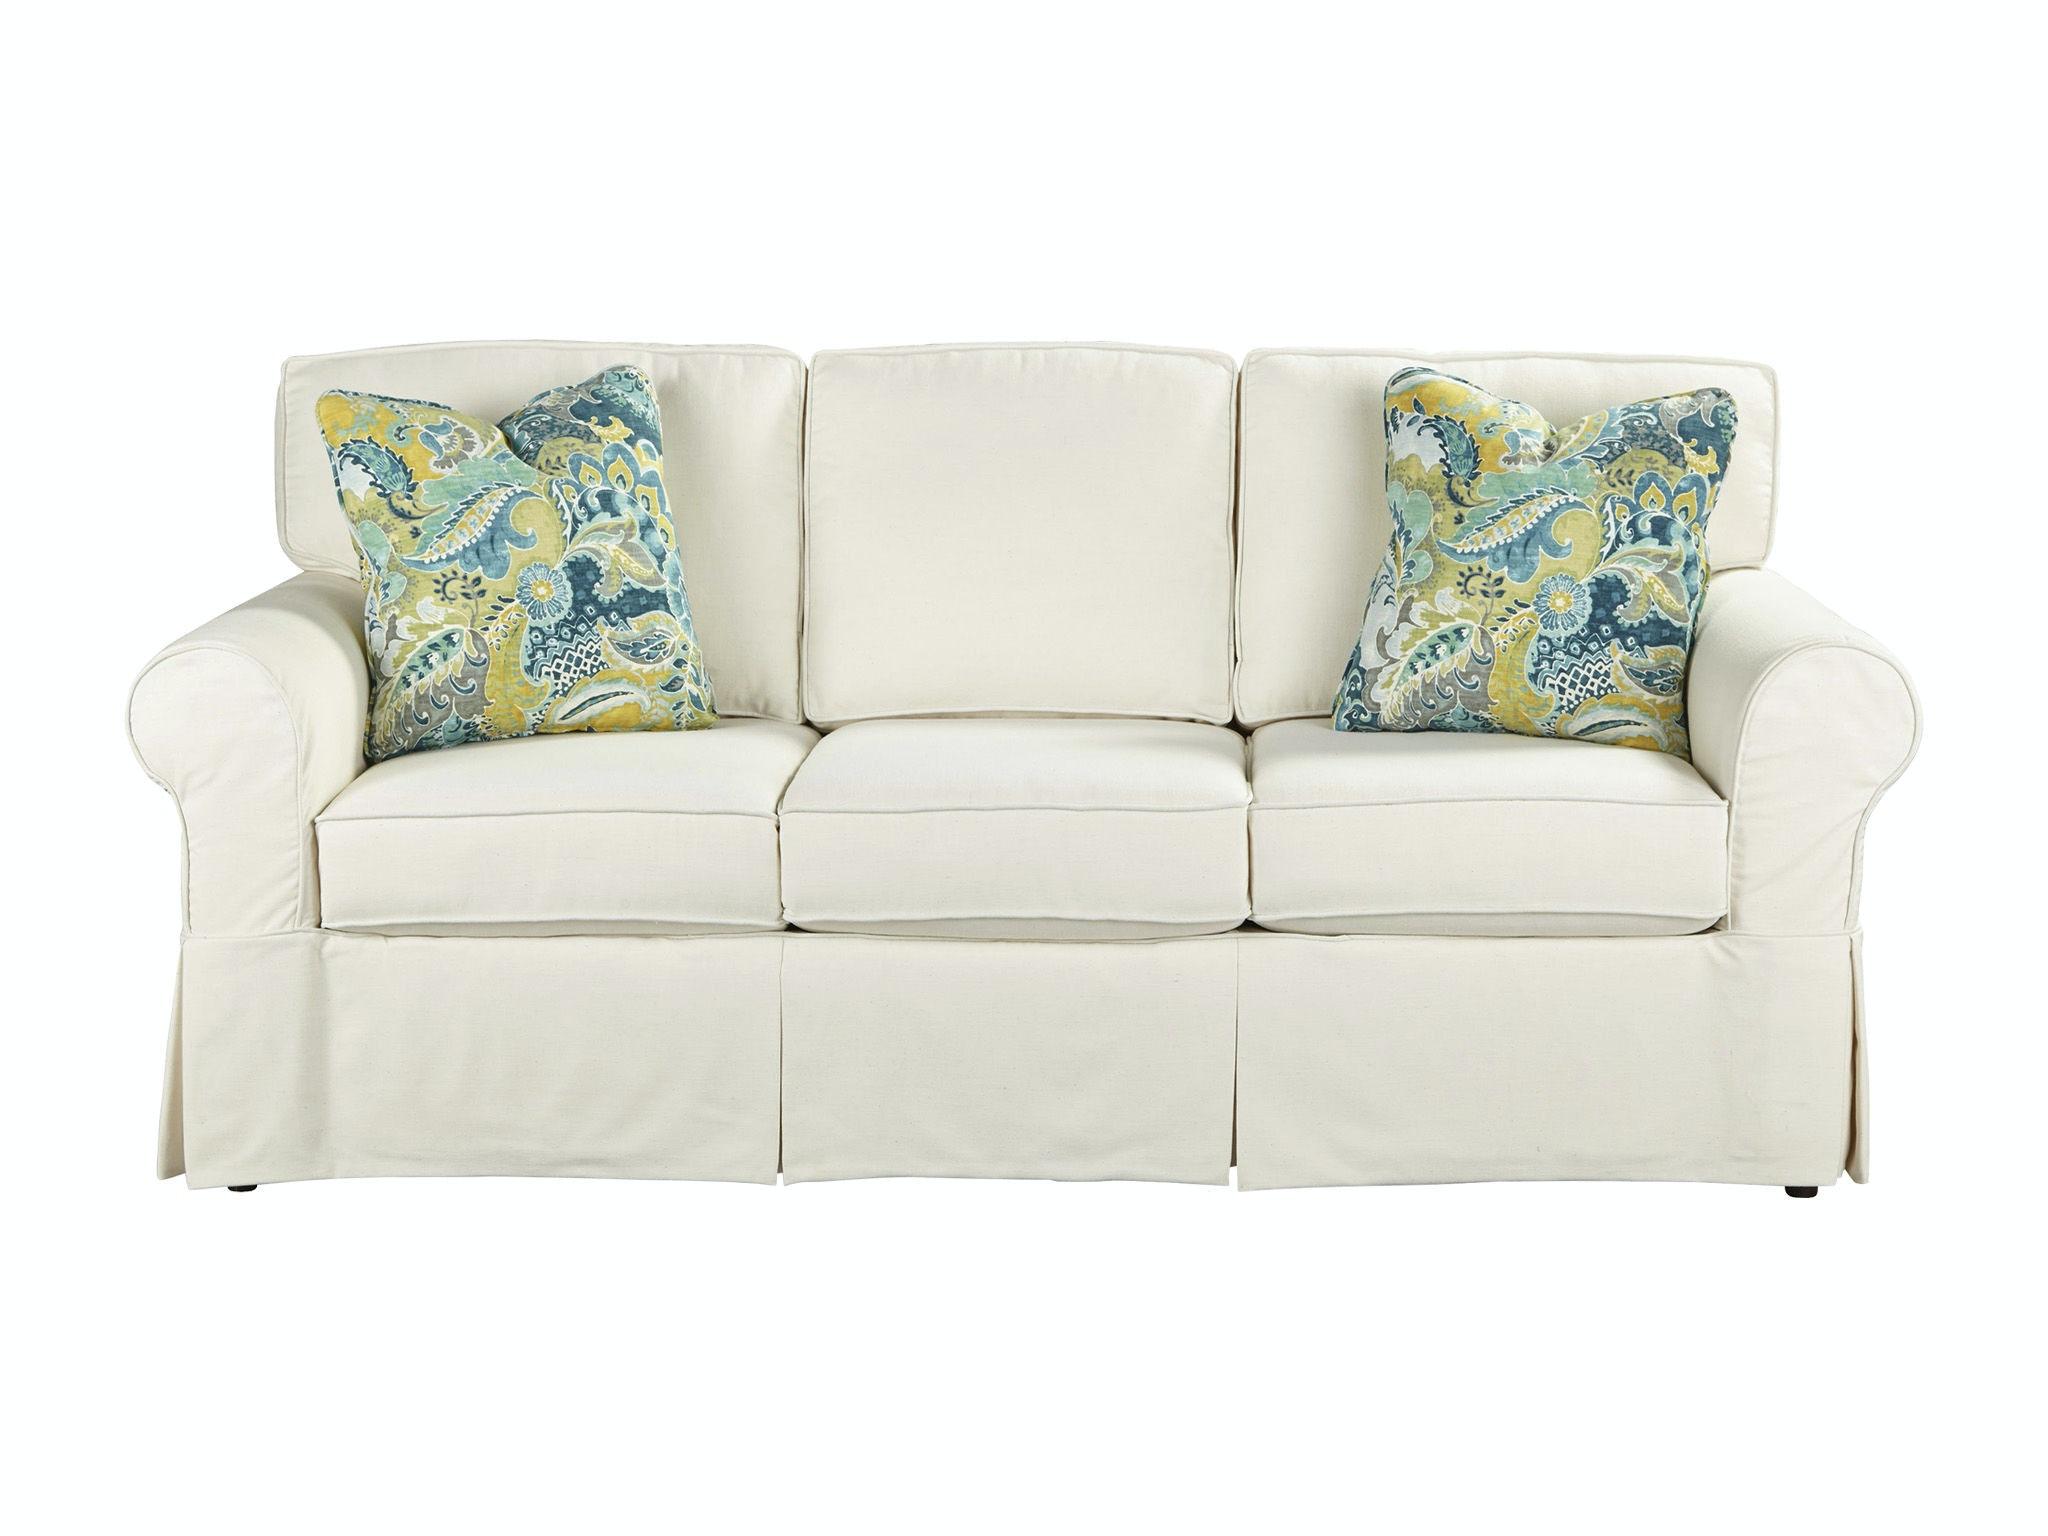 Craftmaster Living Room Sleeper Sofa 92295068 Sleeper CraftMaster